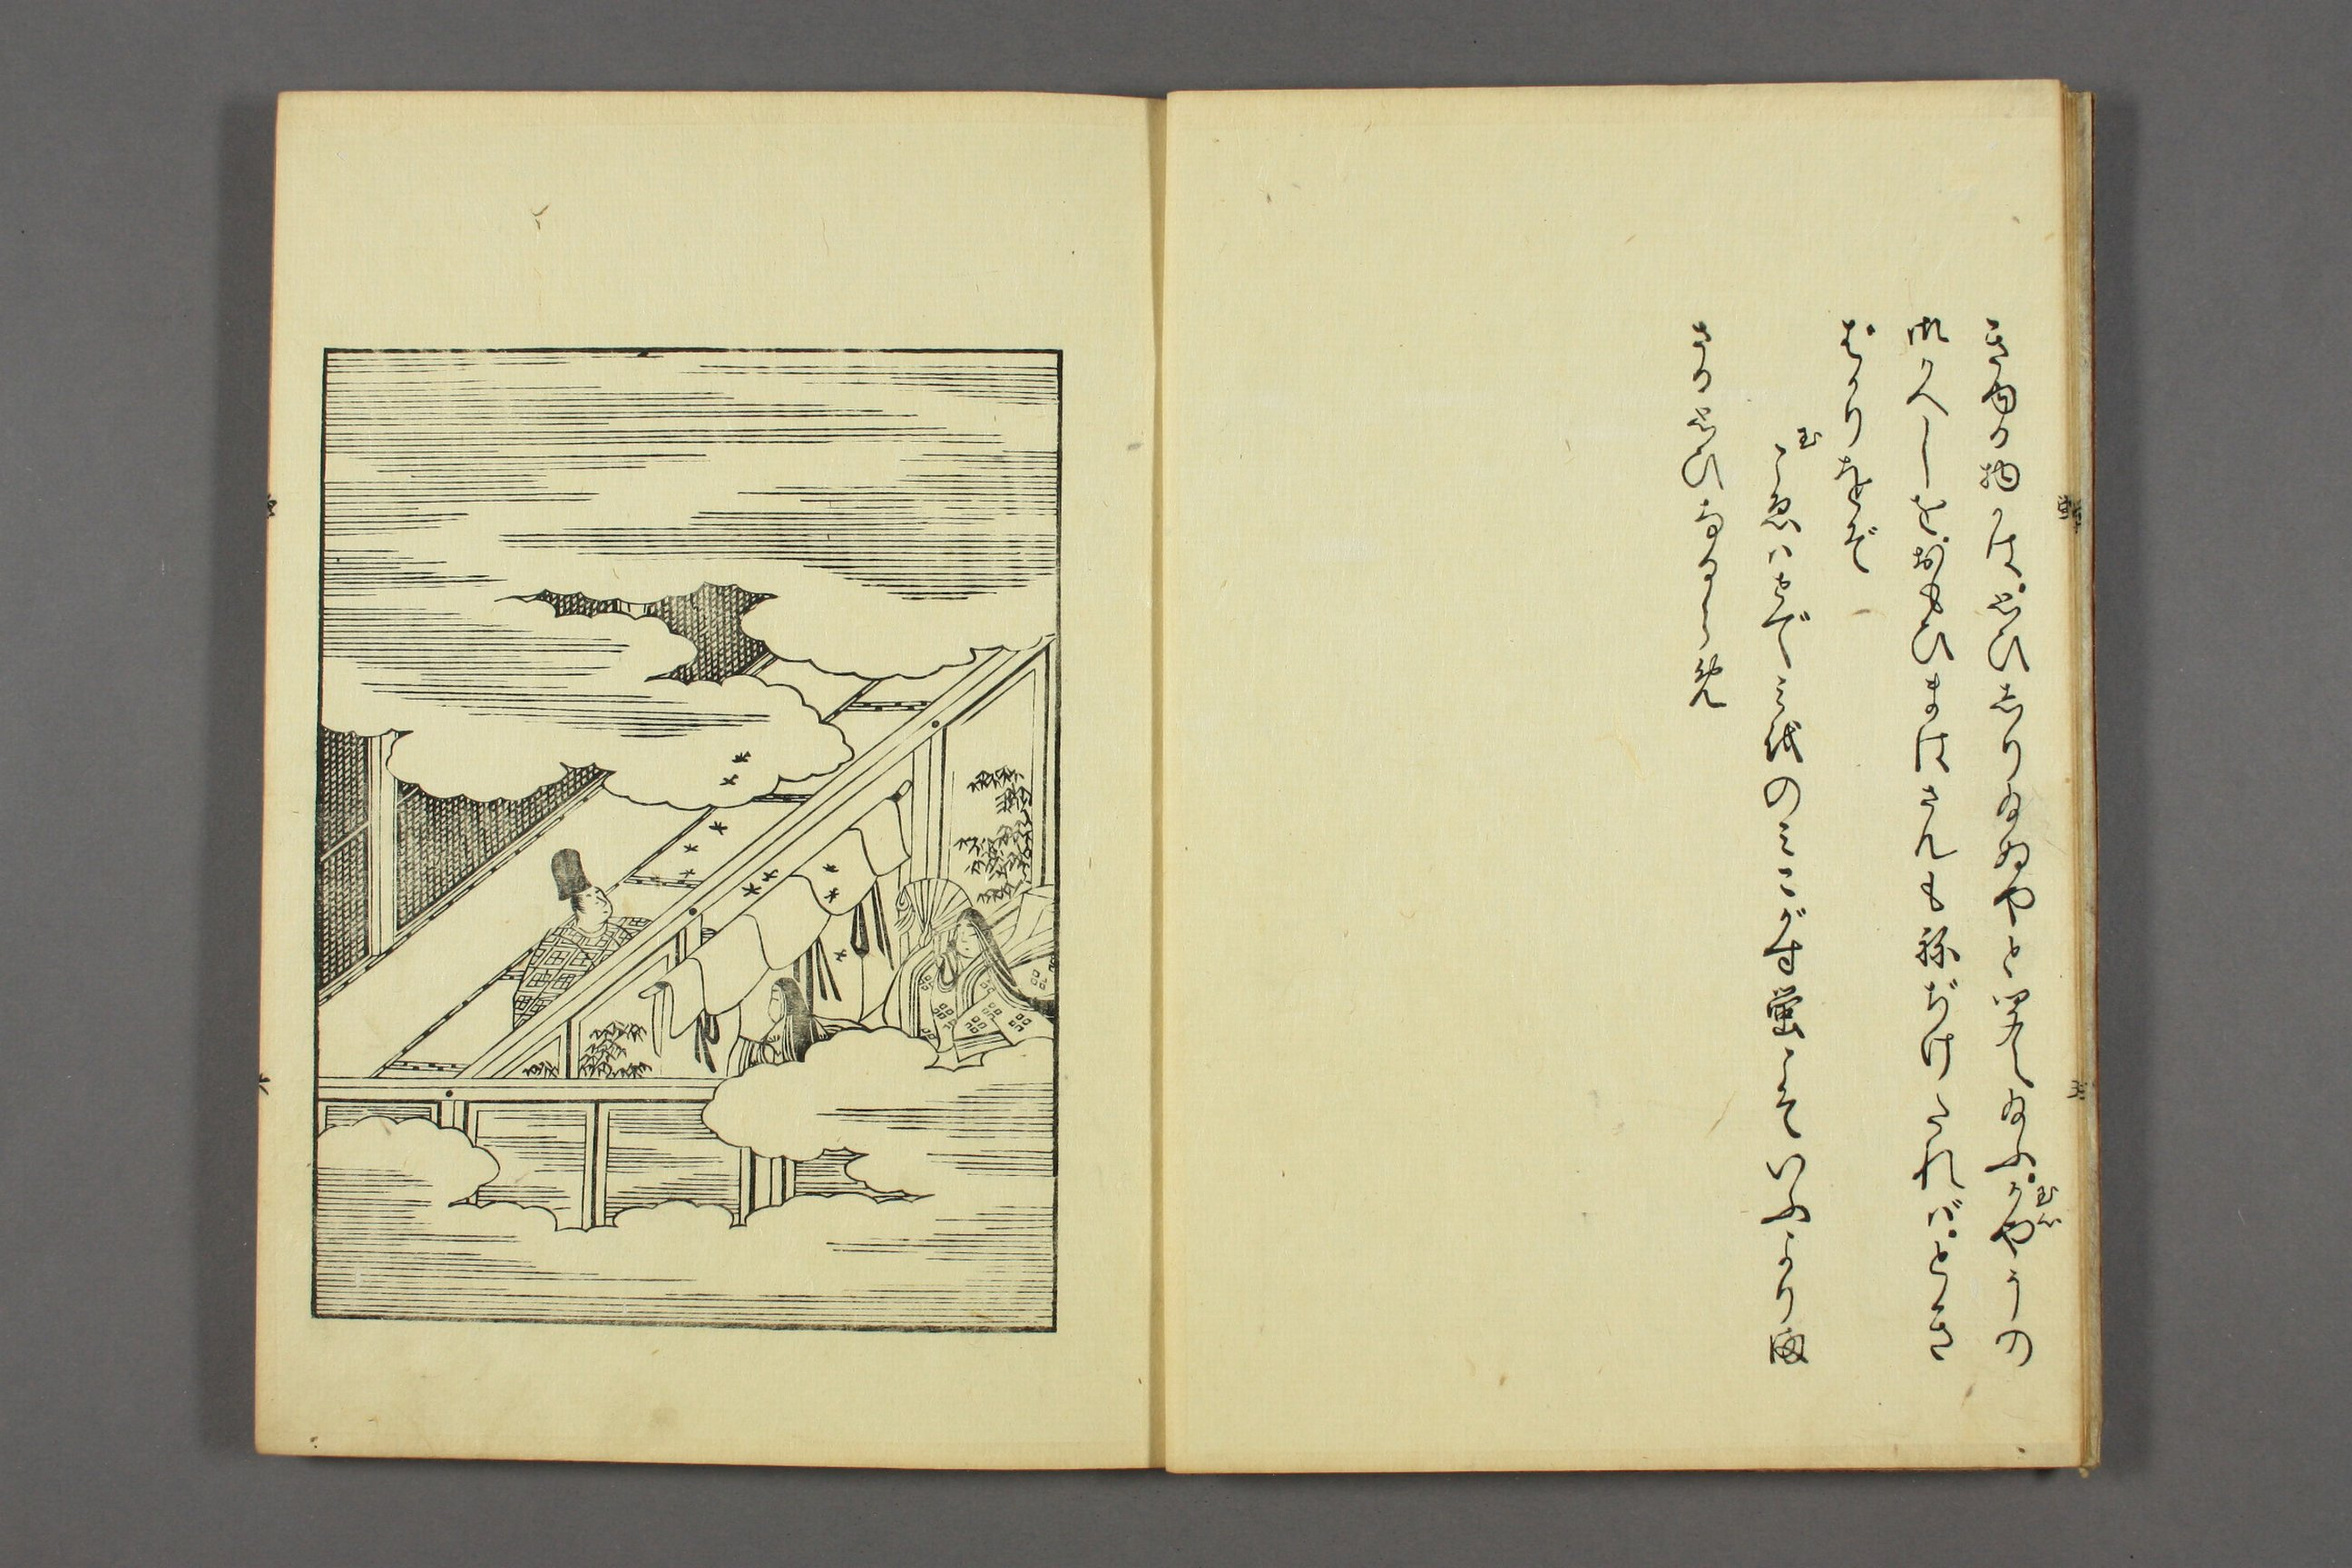 http://archive.wul.waseda.ac.jp/kosho/bunko30/bunko30_a0007/bunko30_a0007_0025/bunko30_a0007_0025_p0007.jpg